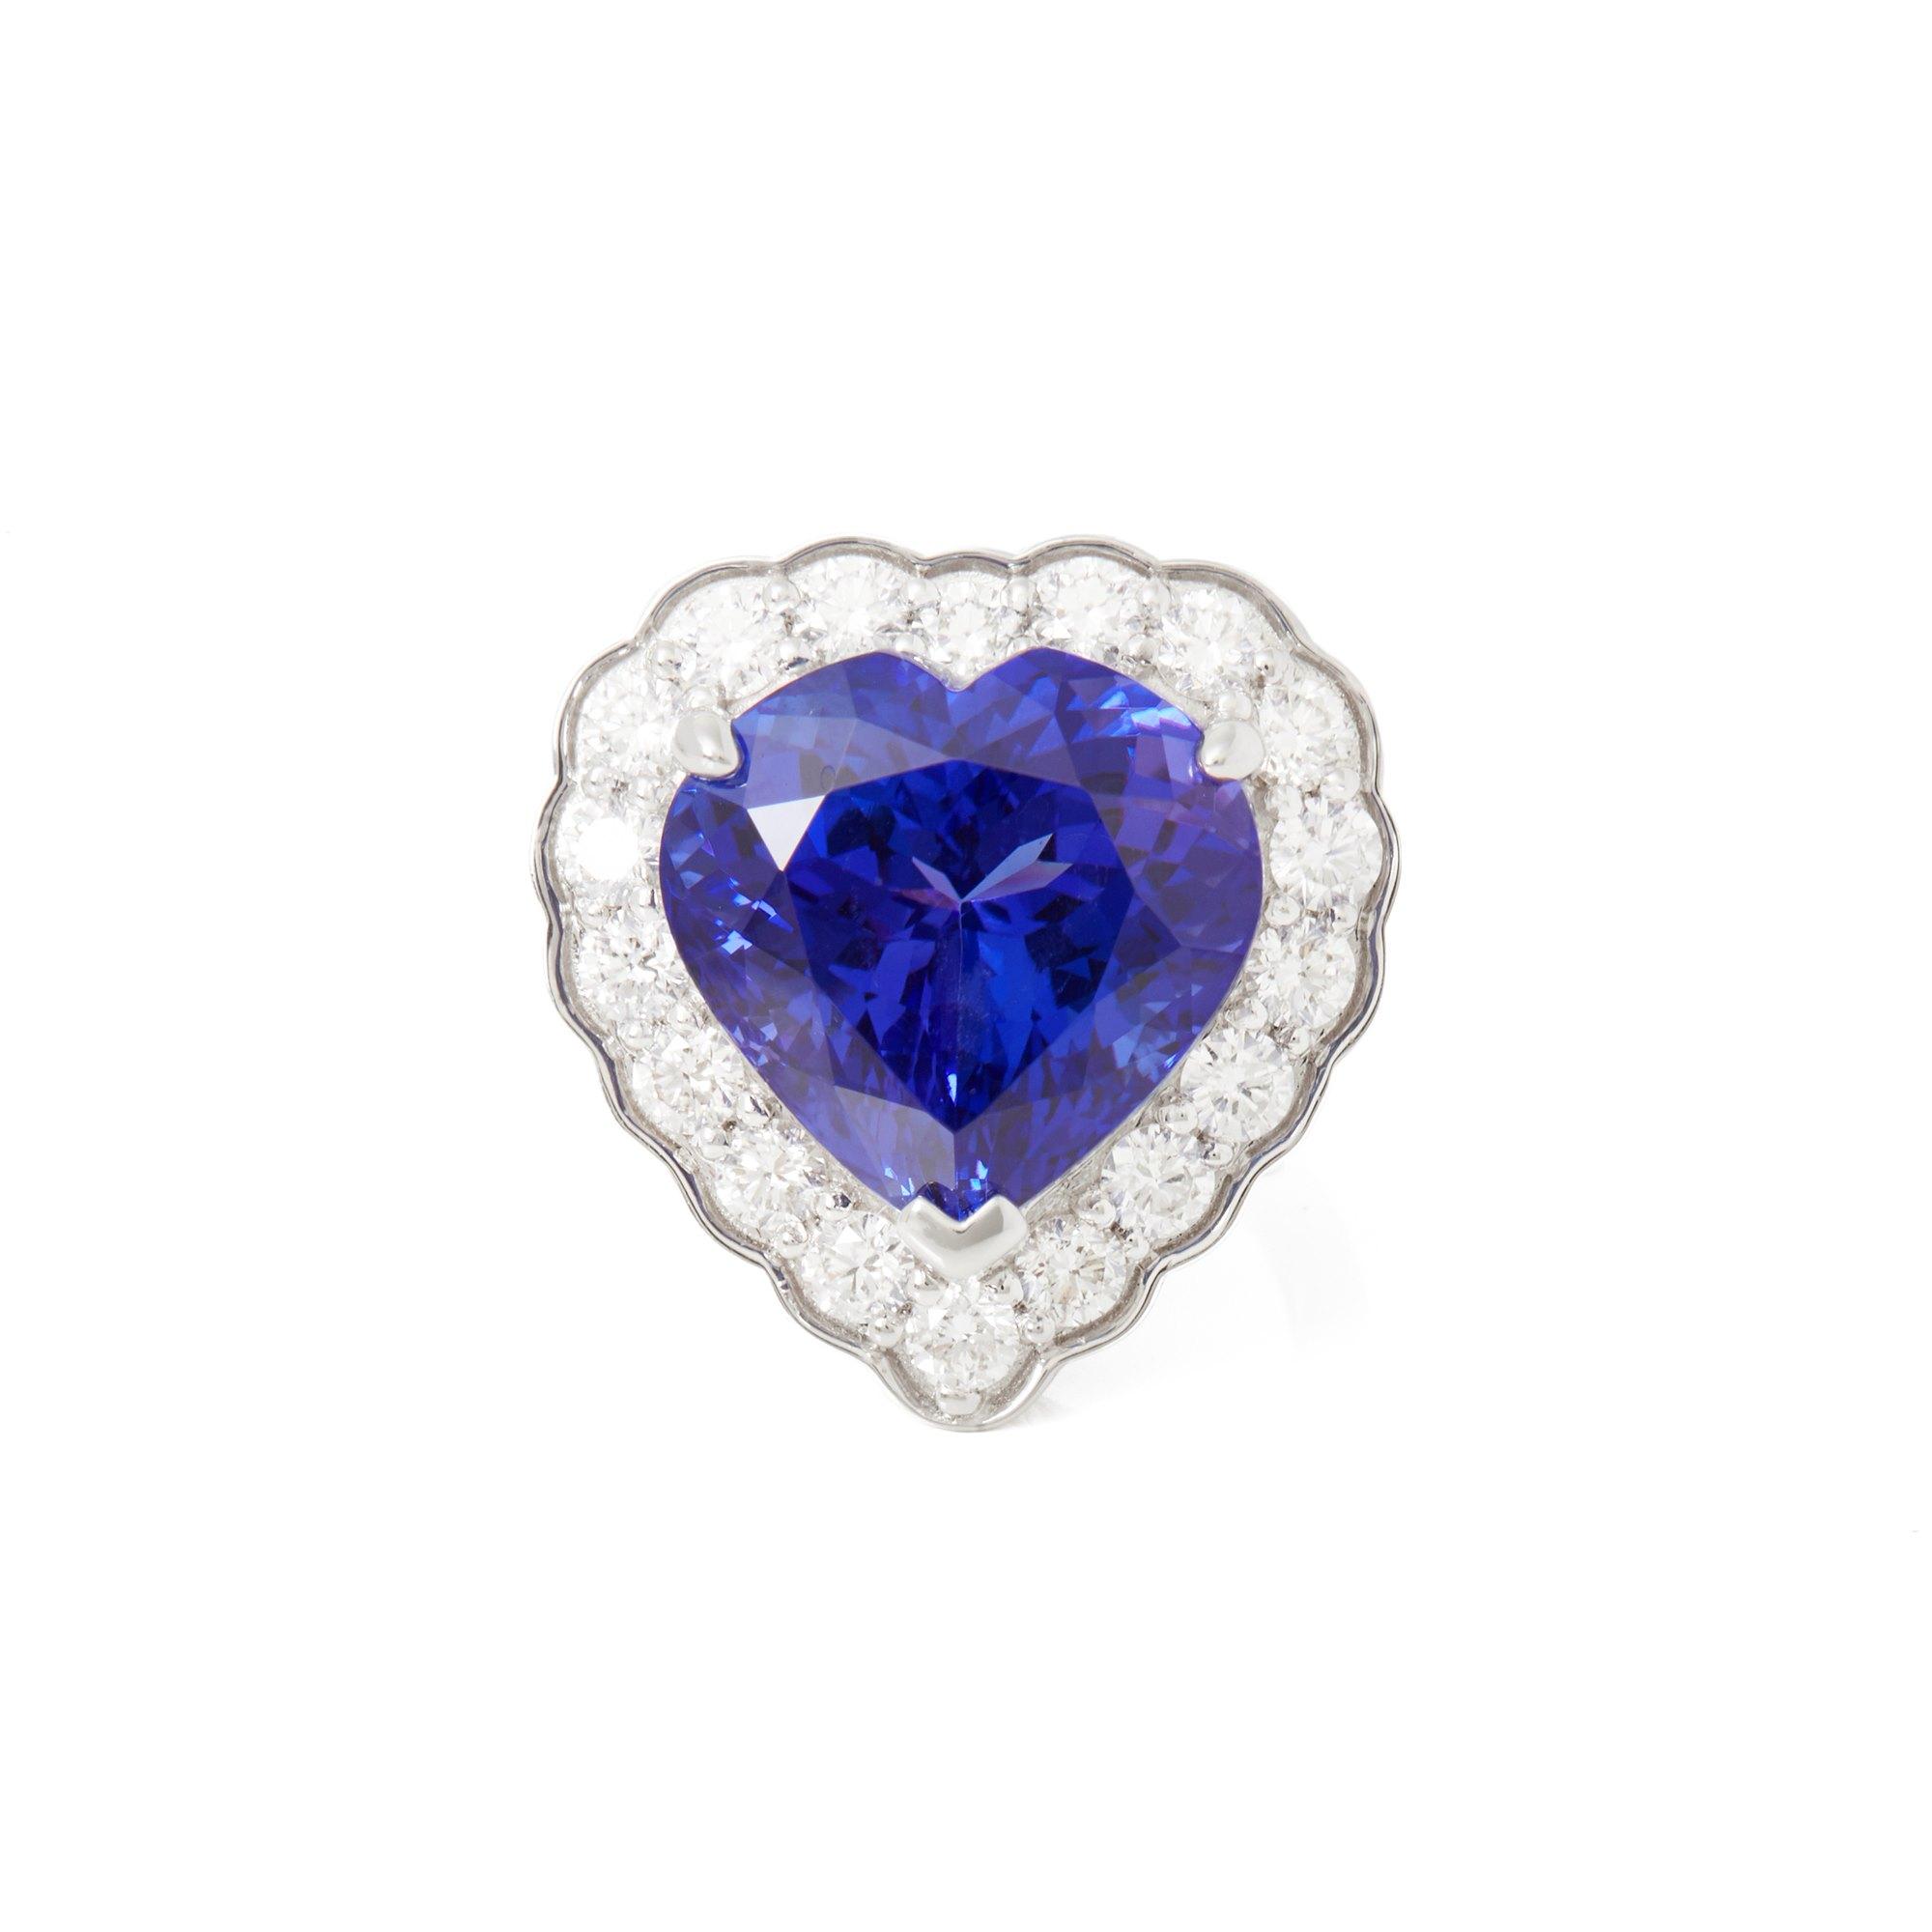 David Jerome Certified 15.44ct Heart Cut Tanzanite and Diamond 18ct Gold Ring